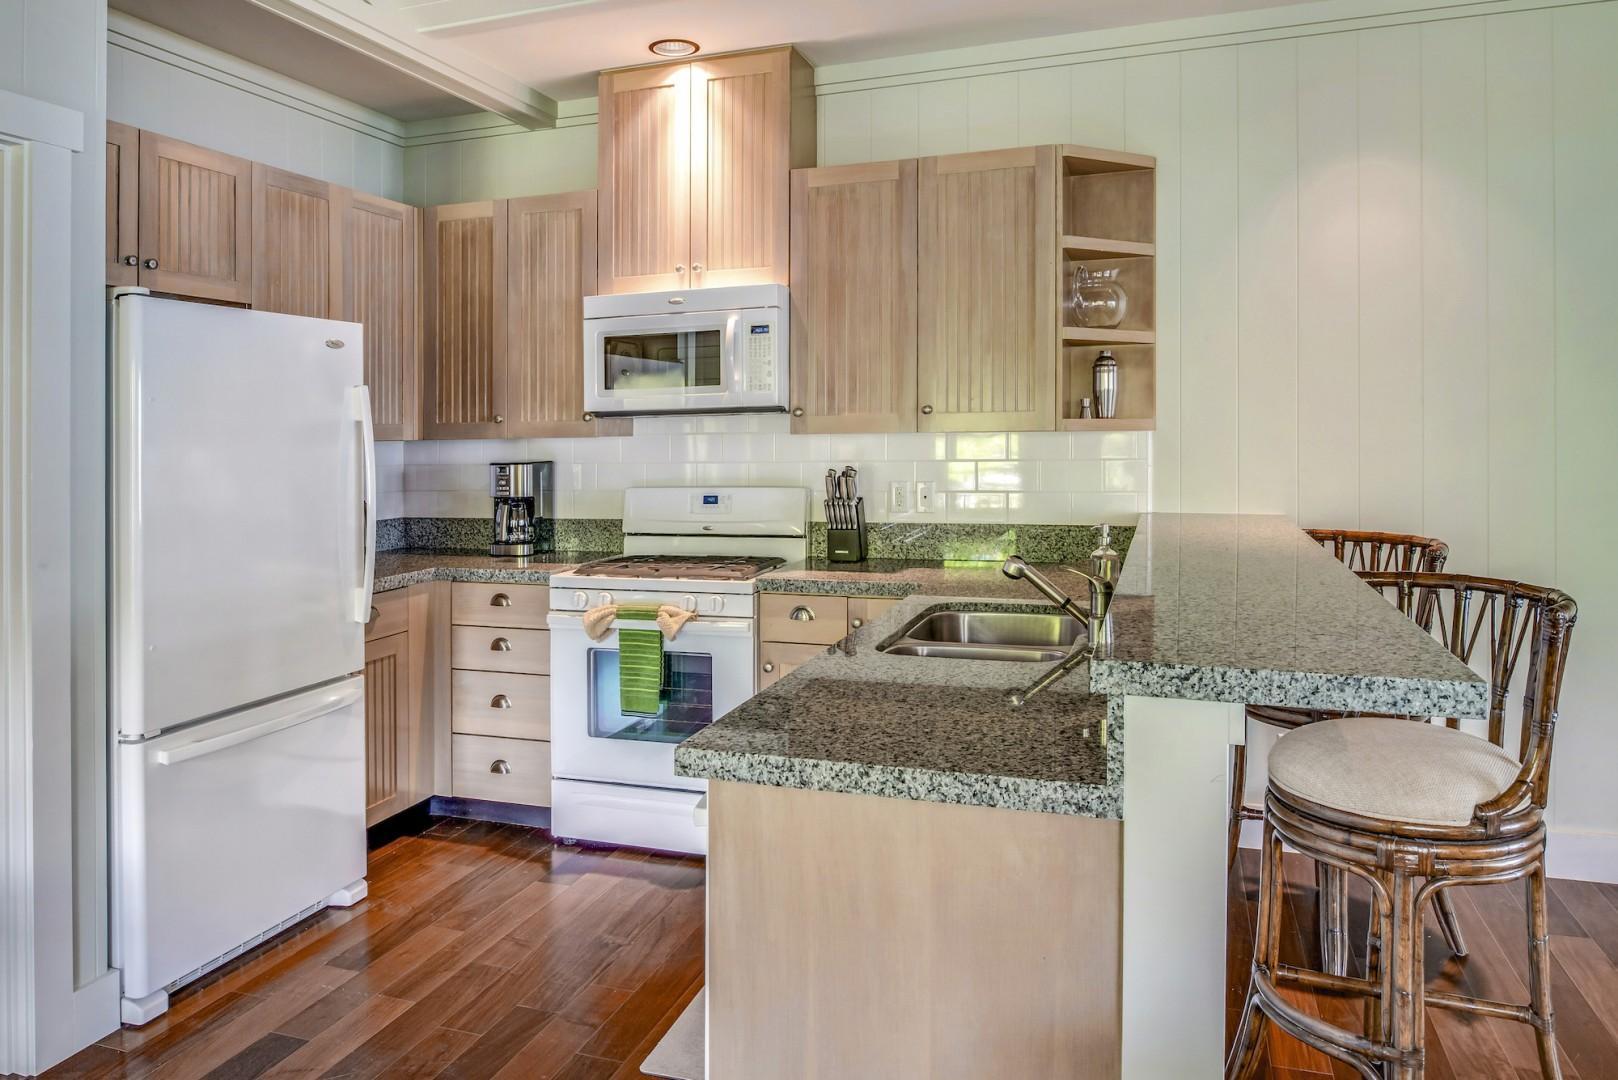 Ohana Guest Cottage Kitchen w/ Gas Range and Breakfast Bar, Ocean View